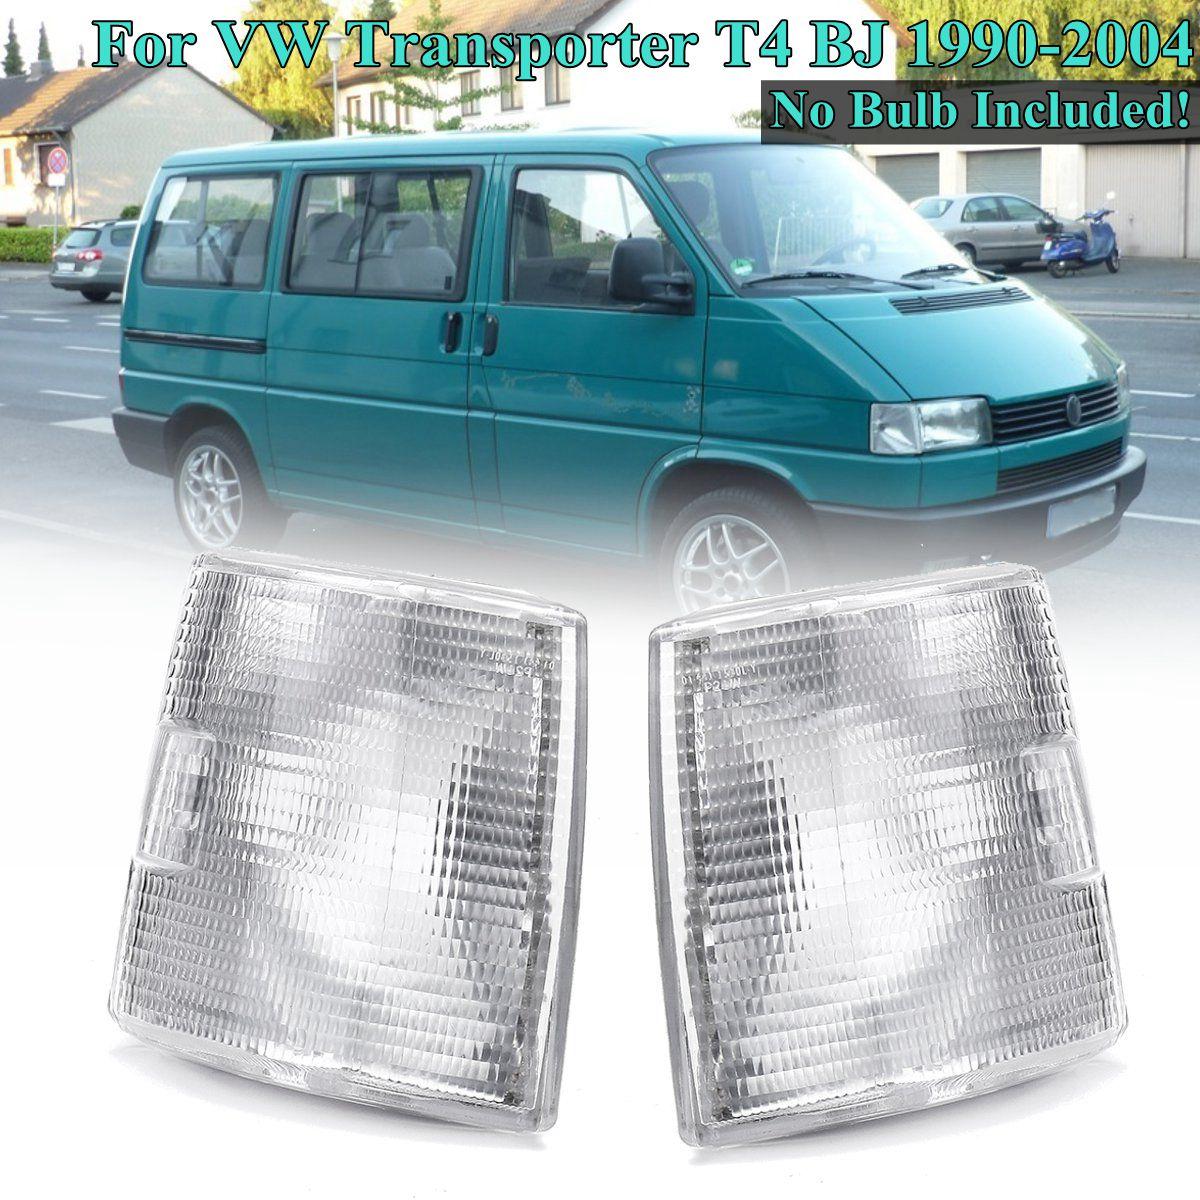 1 par de lâmpadas de sinal de luz de canto frontal, lâmpadas de sinal para vw transformador t4 1990 1991 1992 1993 1994 1995 1996 1998 1999 ~ 2004